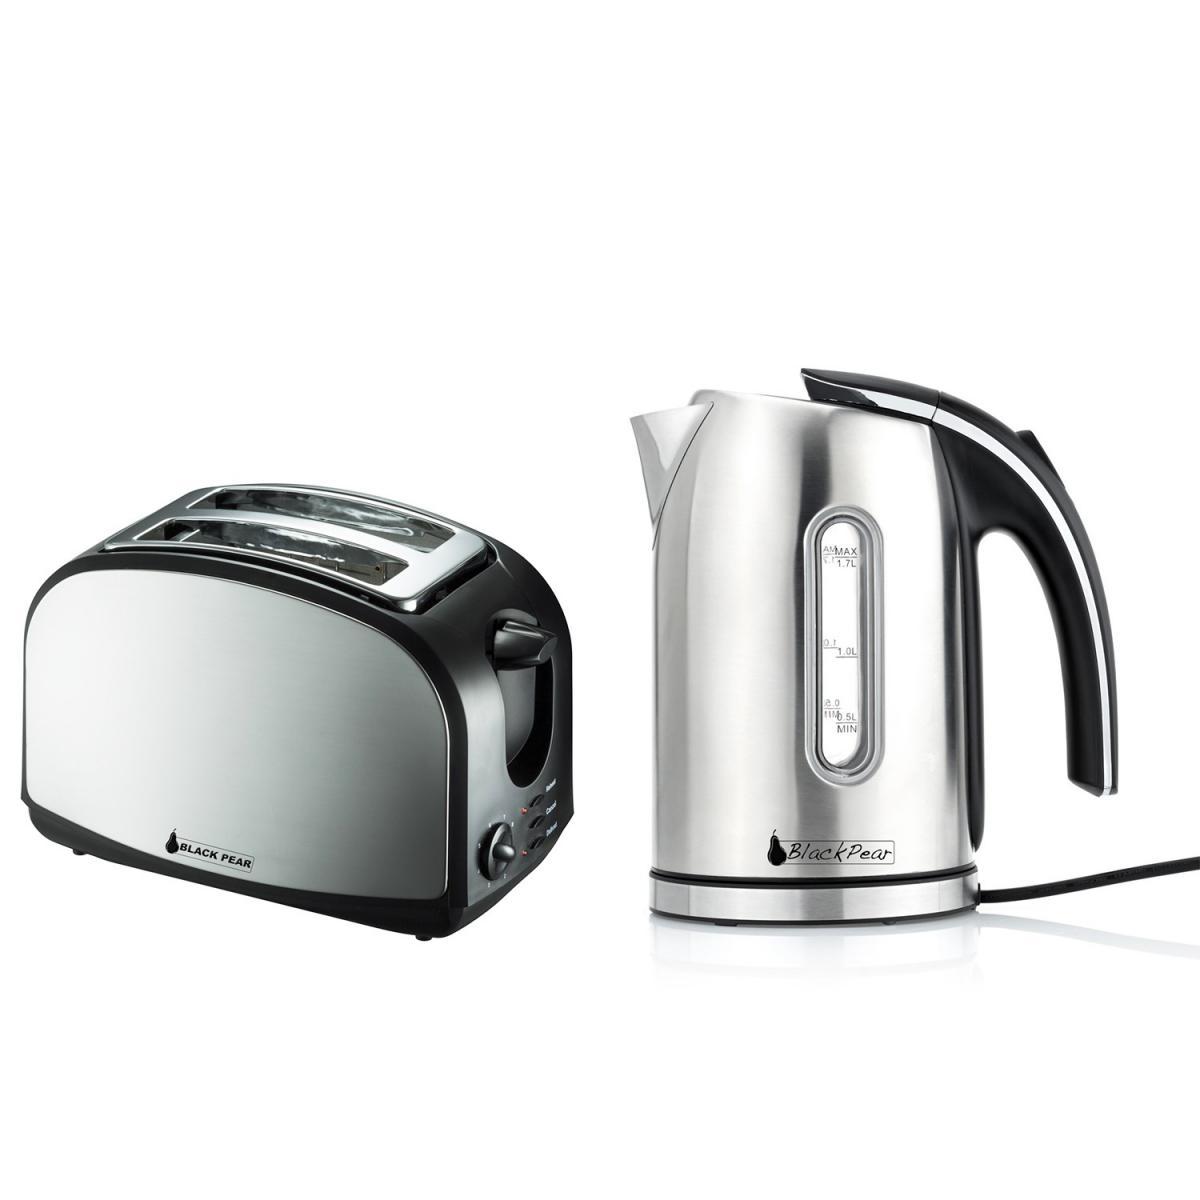 Blackpear Set petit déj - Bouilloire 2200W 1.7L finition inox + Grille-pain 2 fentes inox 900W